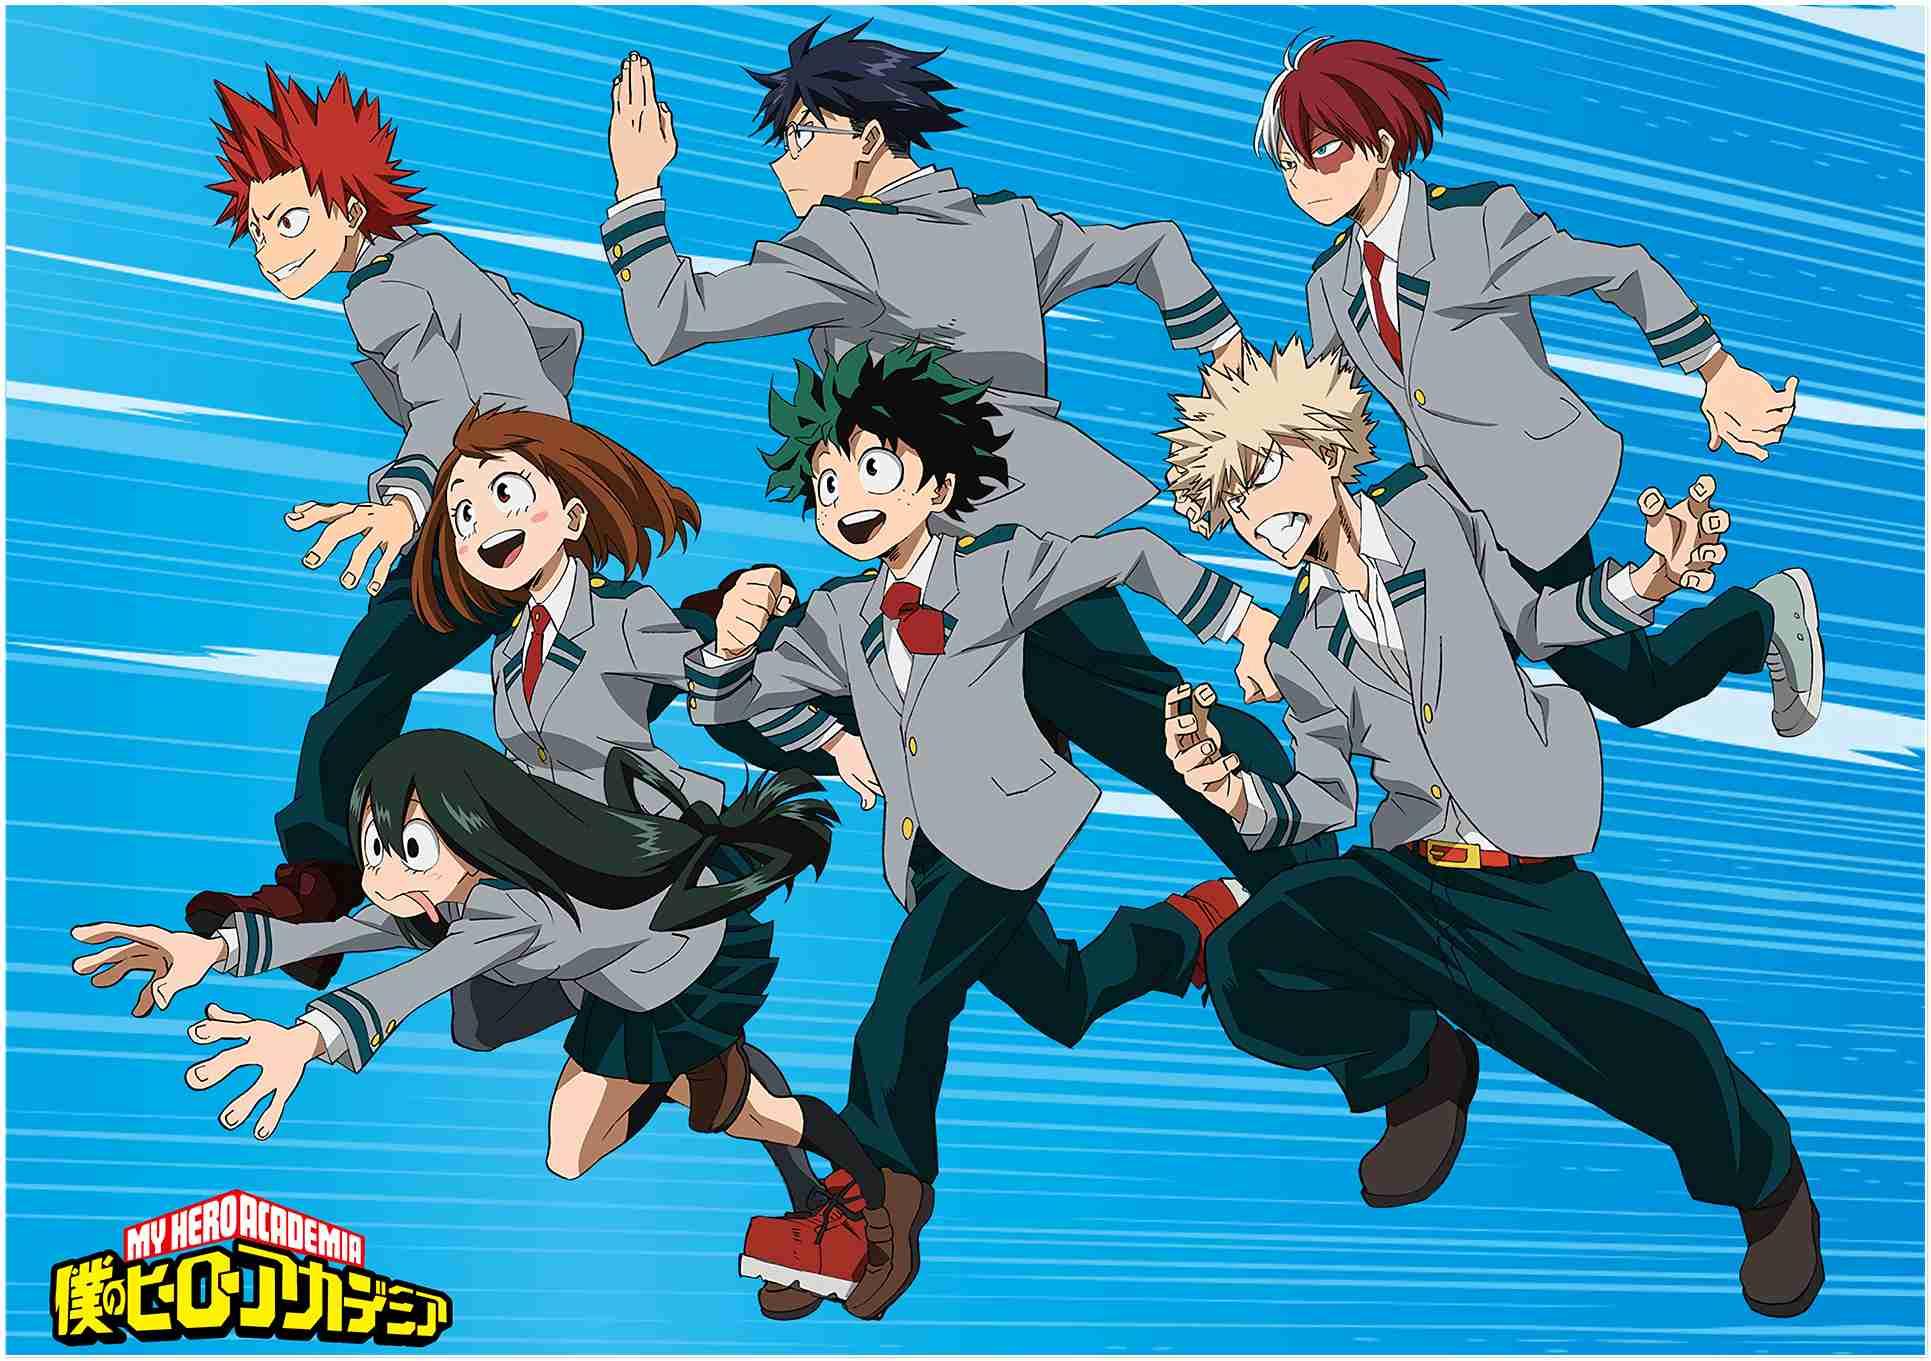 The Best My Hero Academia Wallpapers Beautiful Collection - My Hero Academia Group - HD Wallpaper